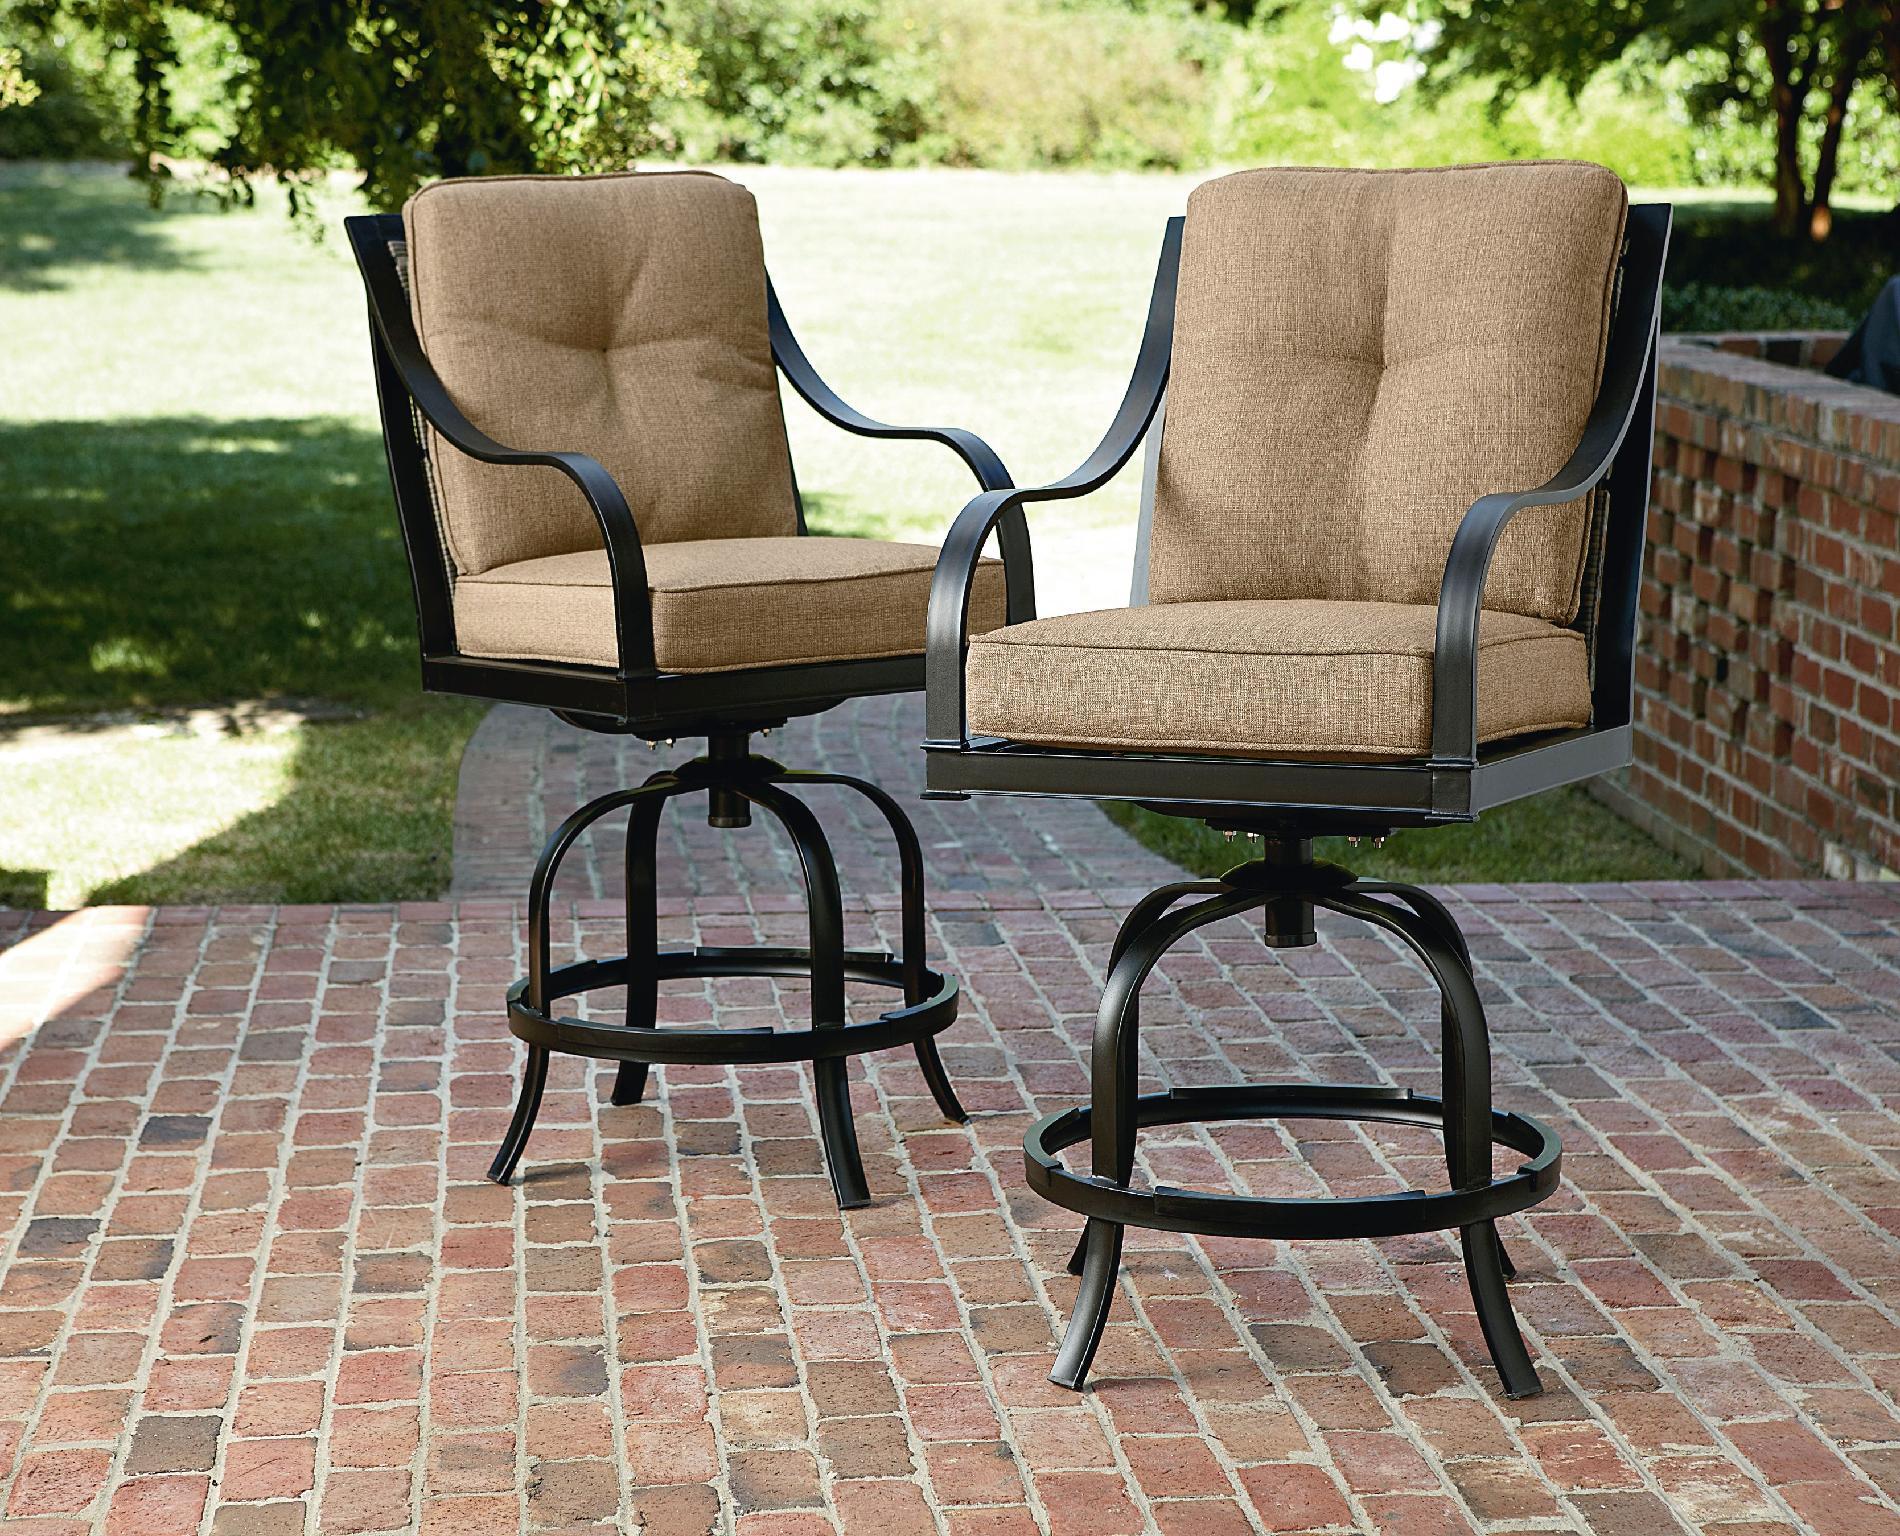 La-boy Outdoor Charlotte 2pk Patio Bar Stools - Living Furniture Seating